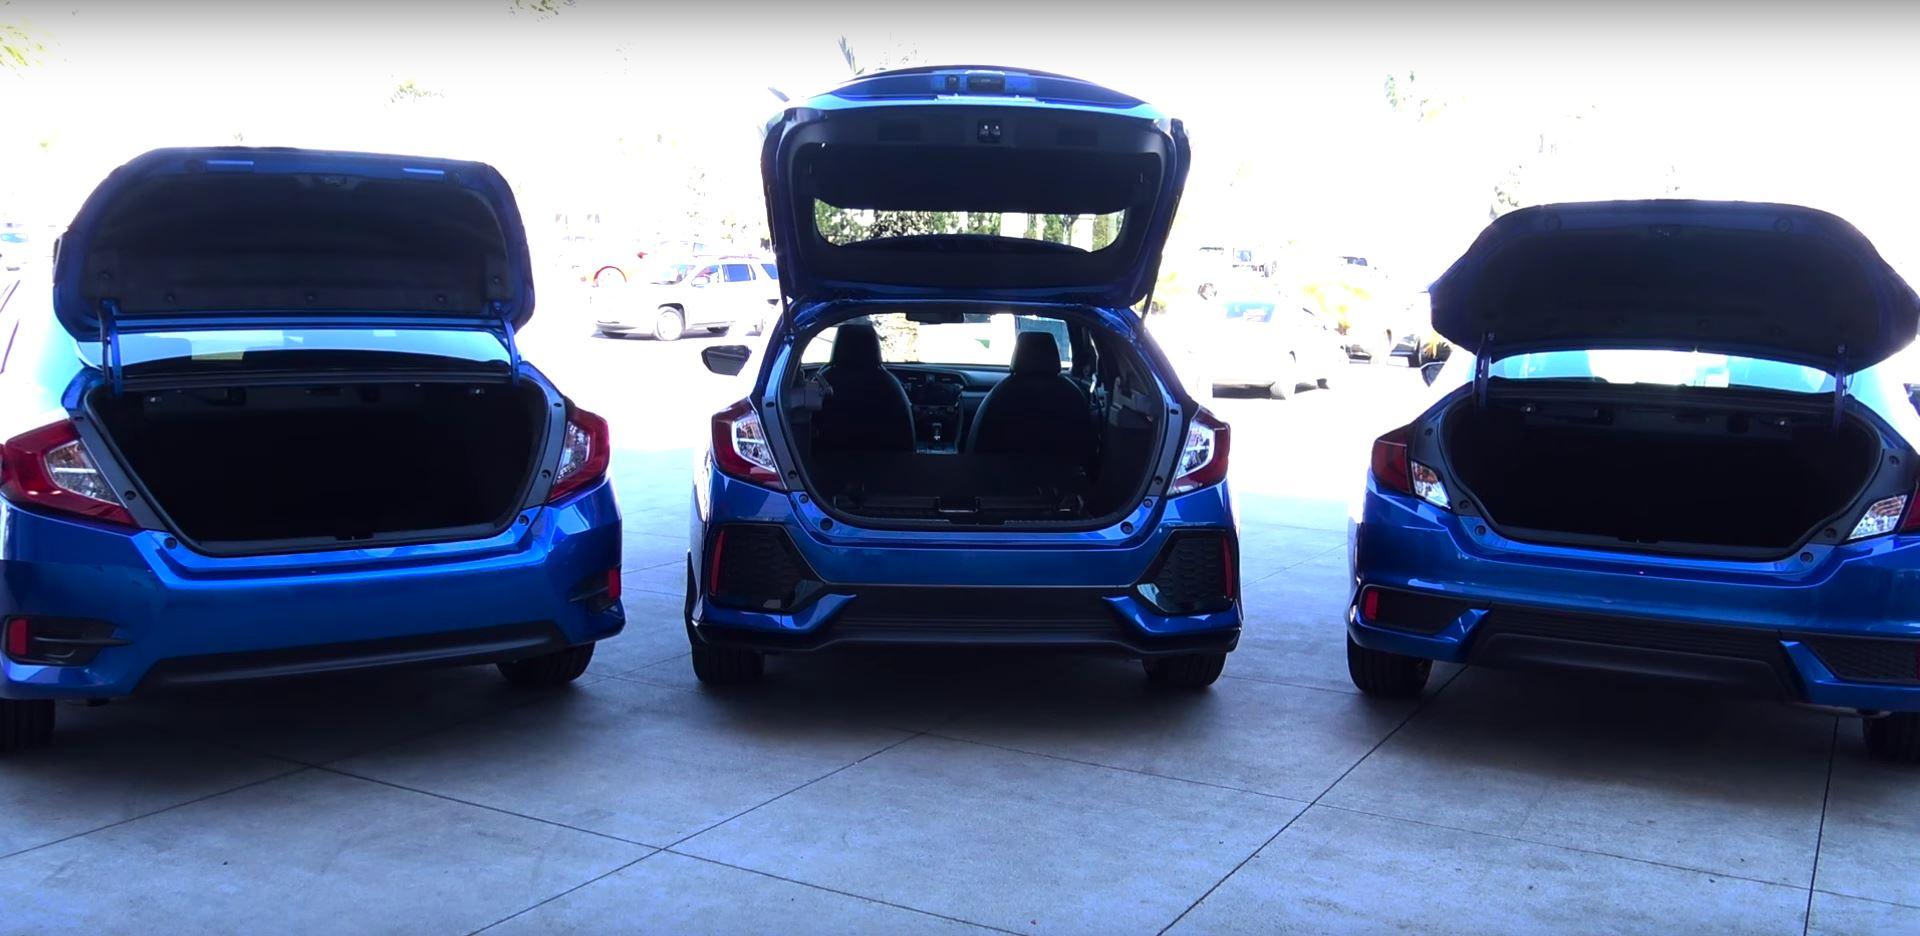 2017 Honda Civic Hatchback Vs Sedan Coupe Comparison